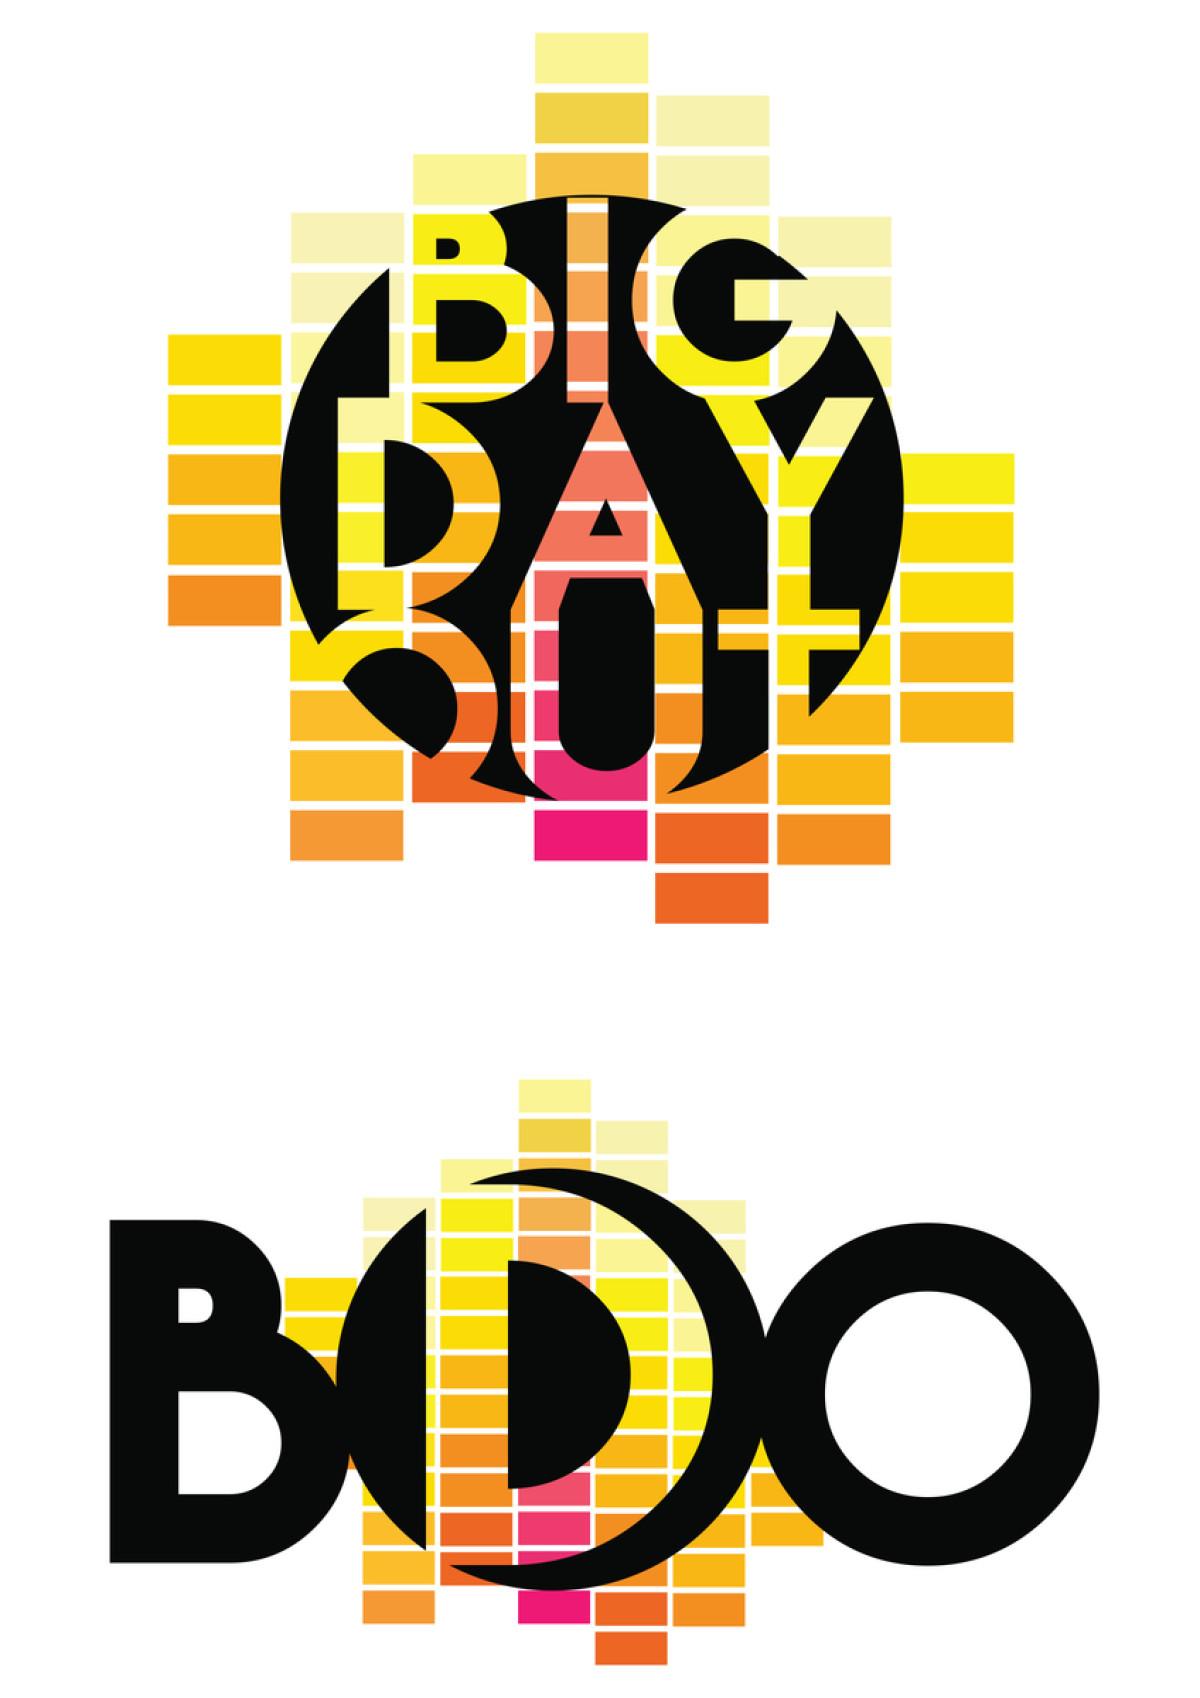 Bdo logo clipart banner free stock BIG SAY OUT BRANDING CONCEPT - Amanda Newton Portfolio - The Loop banner free stock